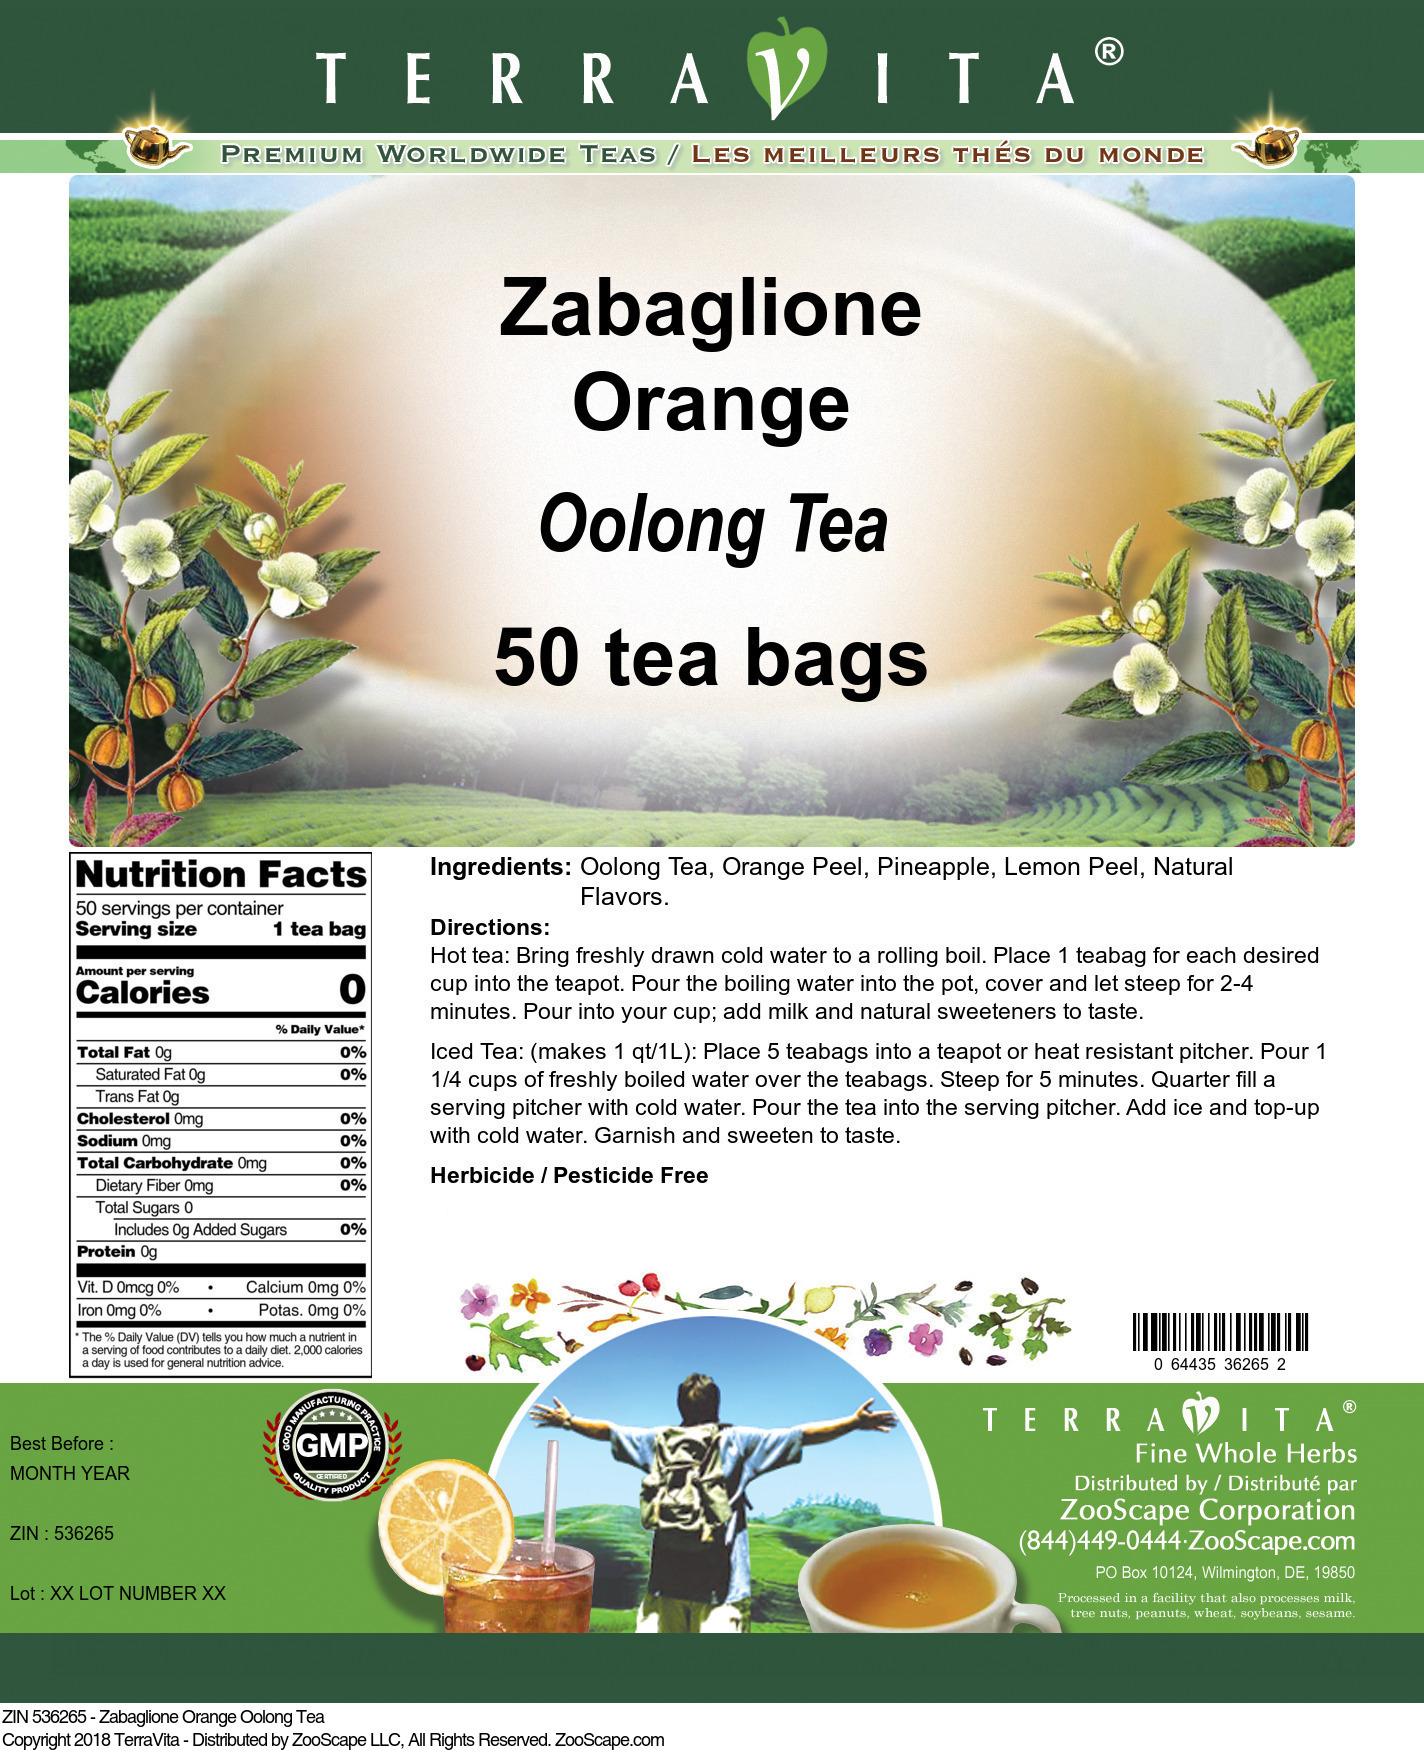 Zabaglione Orange Oolong Tea